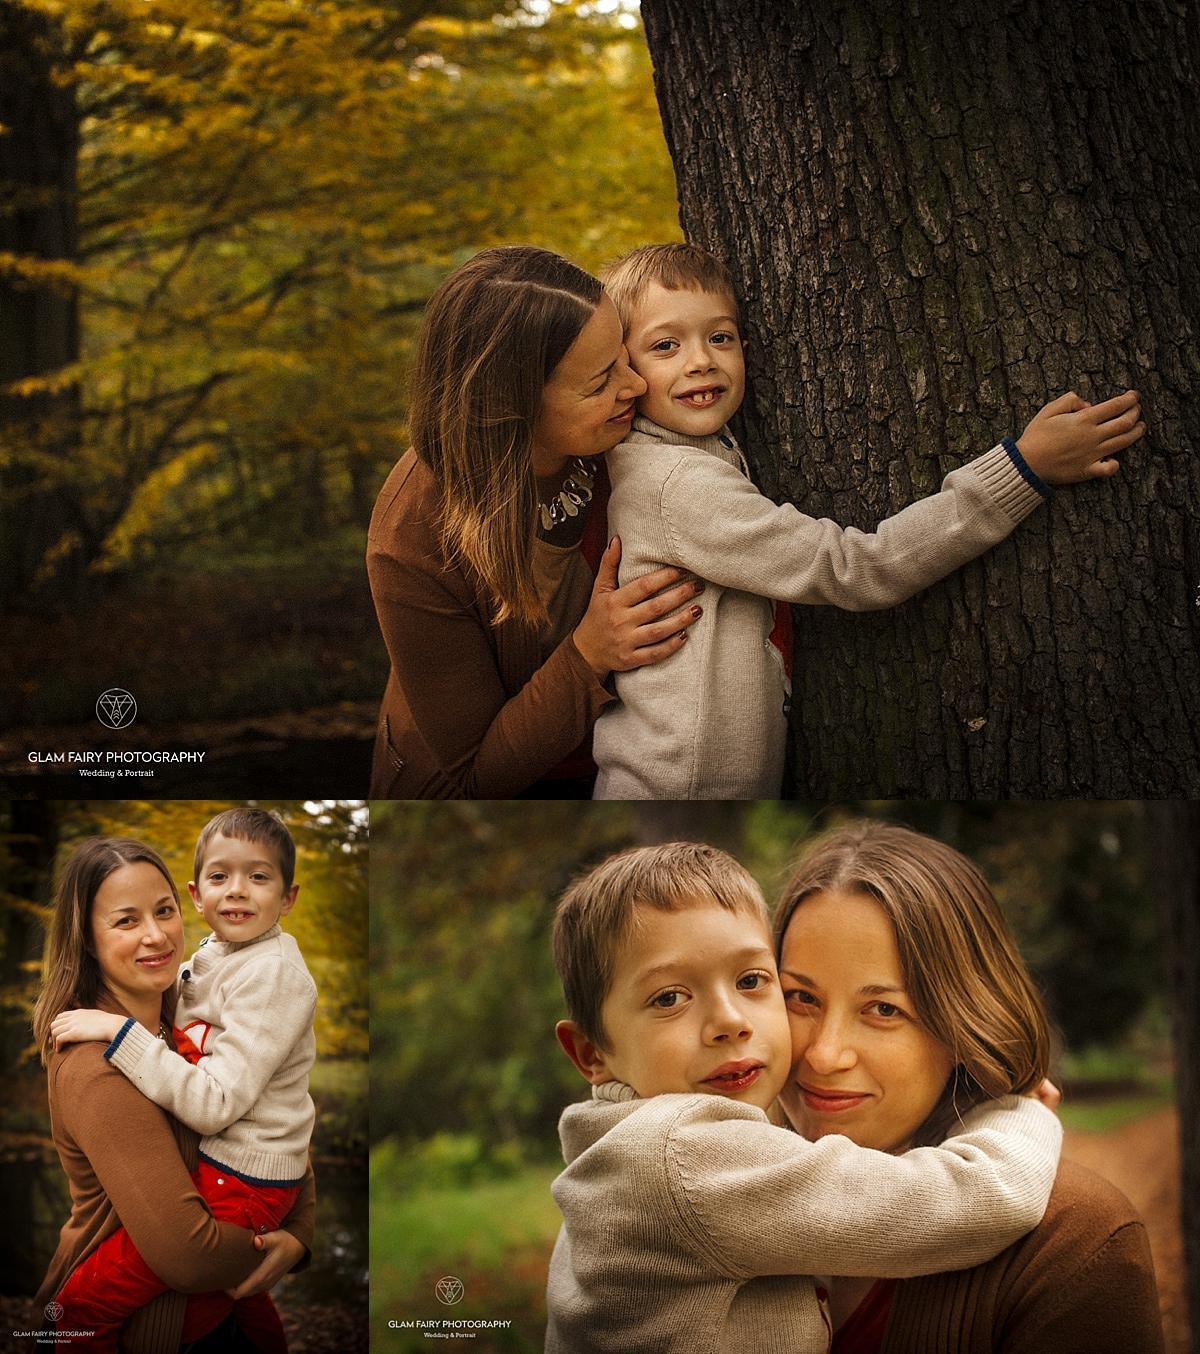 GlamFairyPhotography-mini-session-en-famille-a-vincennes-cecile_0006